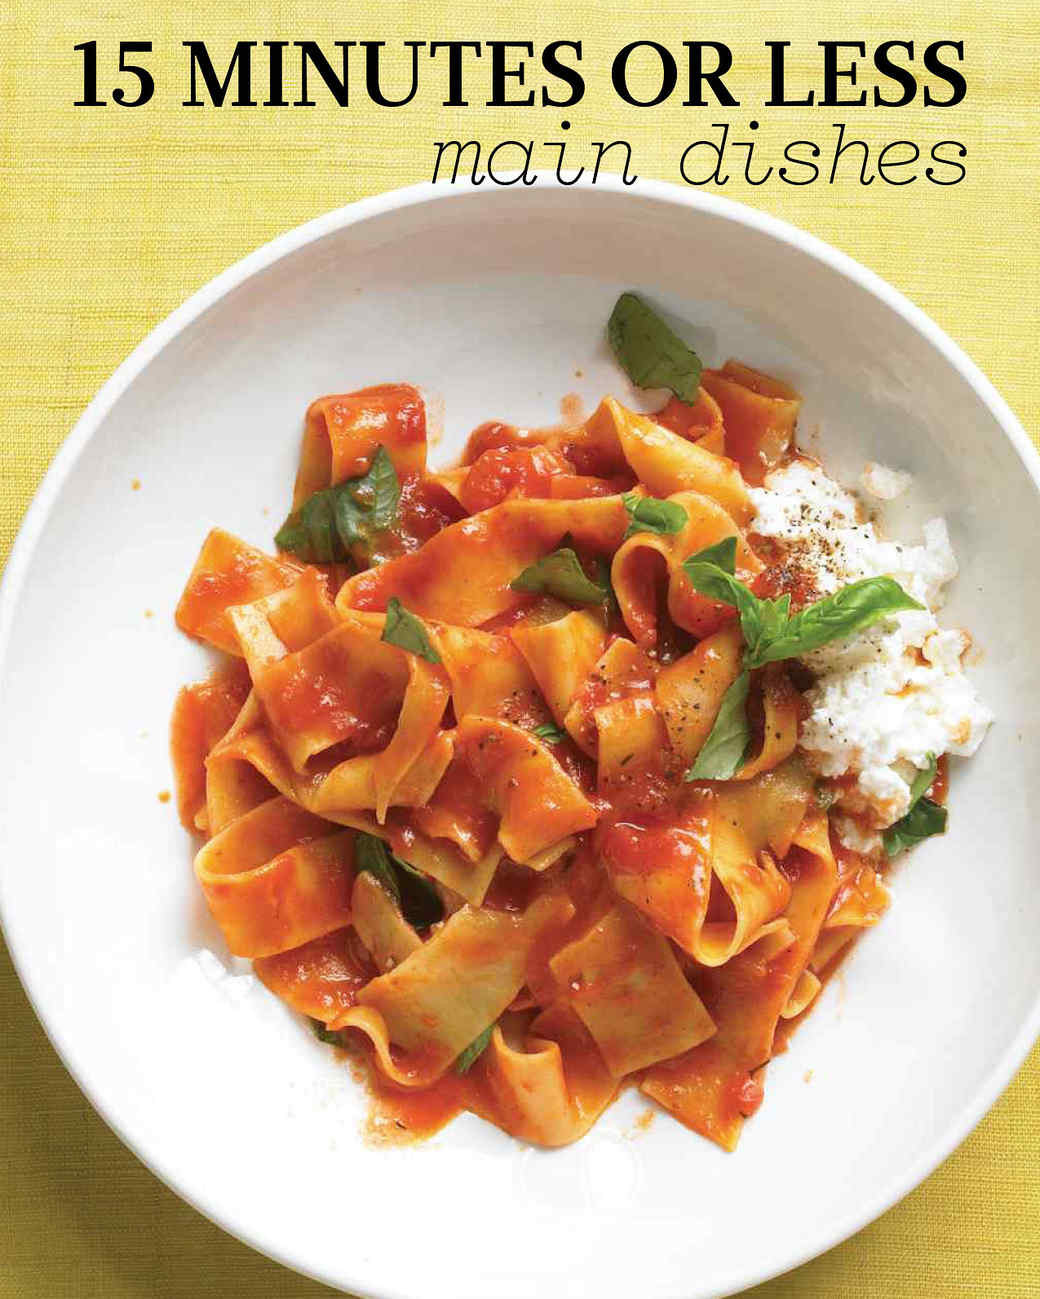 Easy Main Dishes  15 Minutes or Less Main Dish Recipes